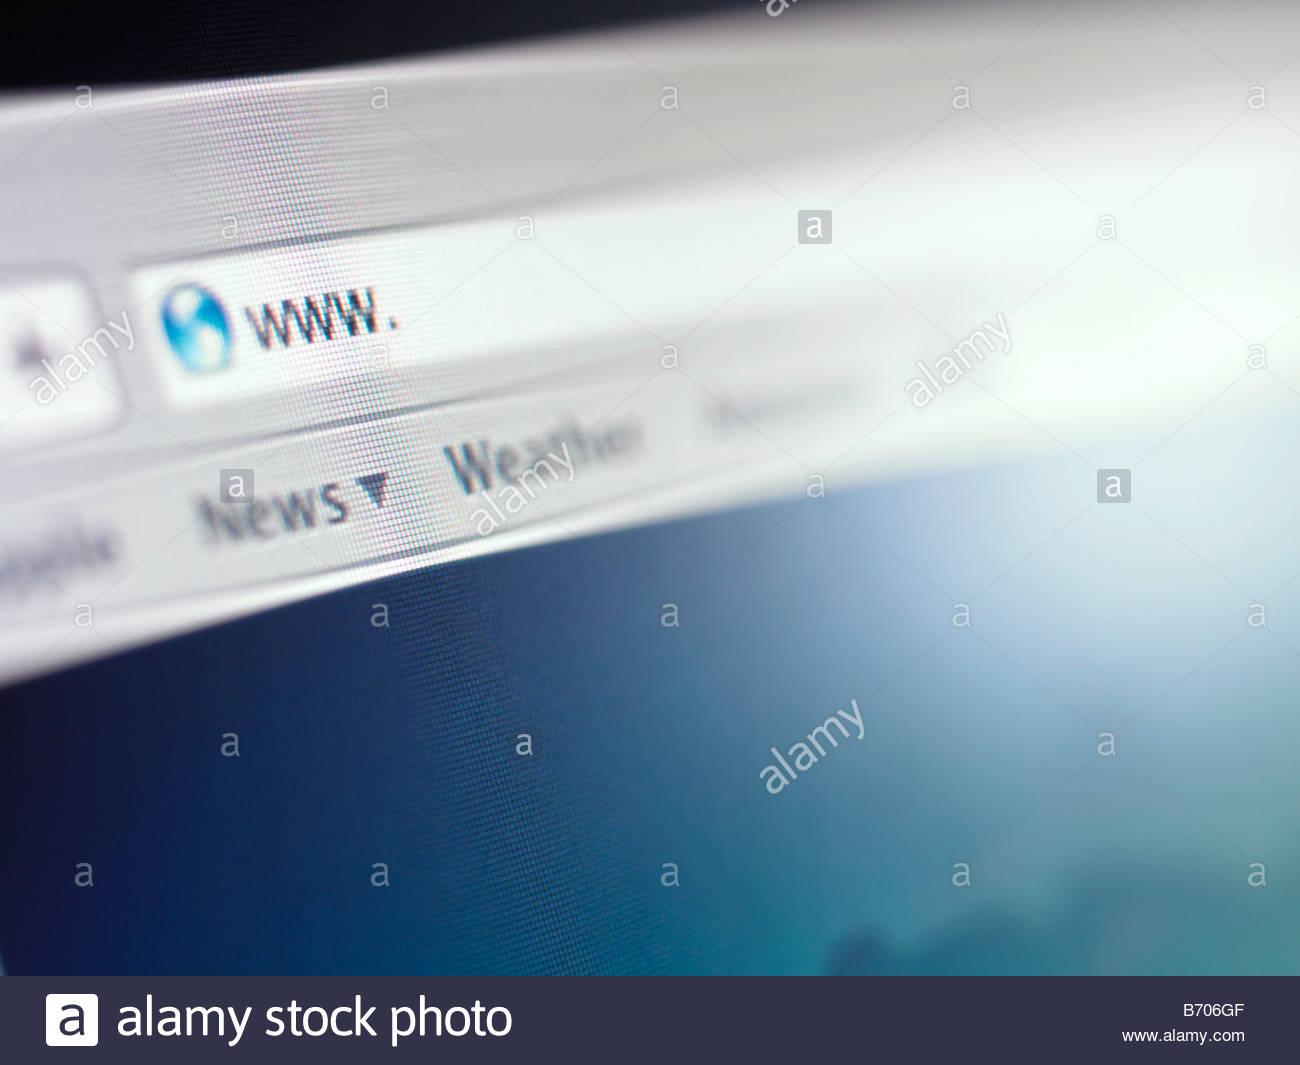 Close up of address bar on internet browser - Stock Image